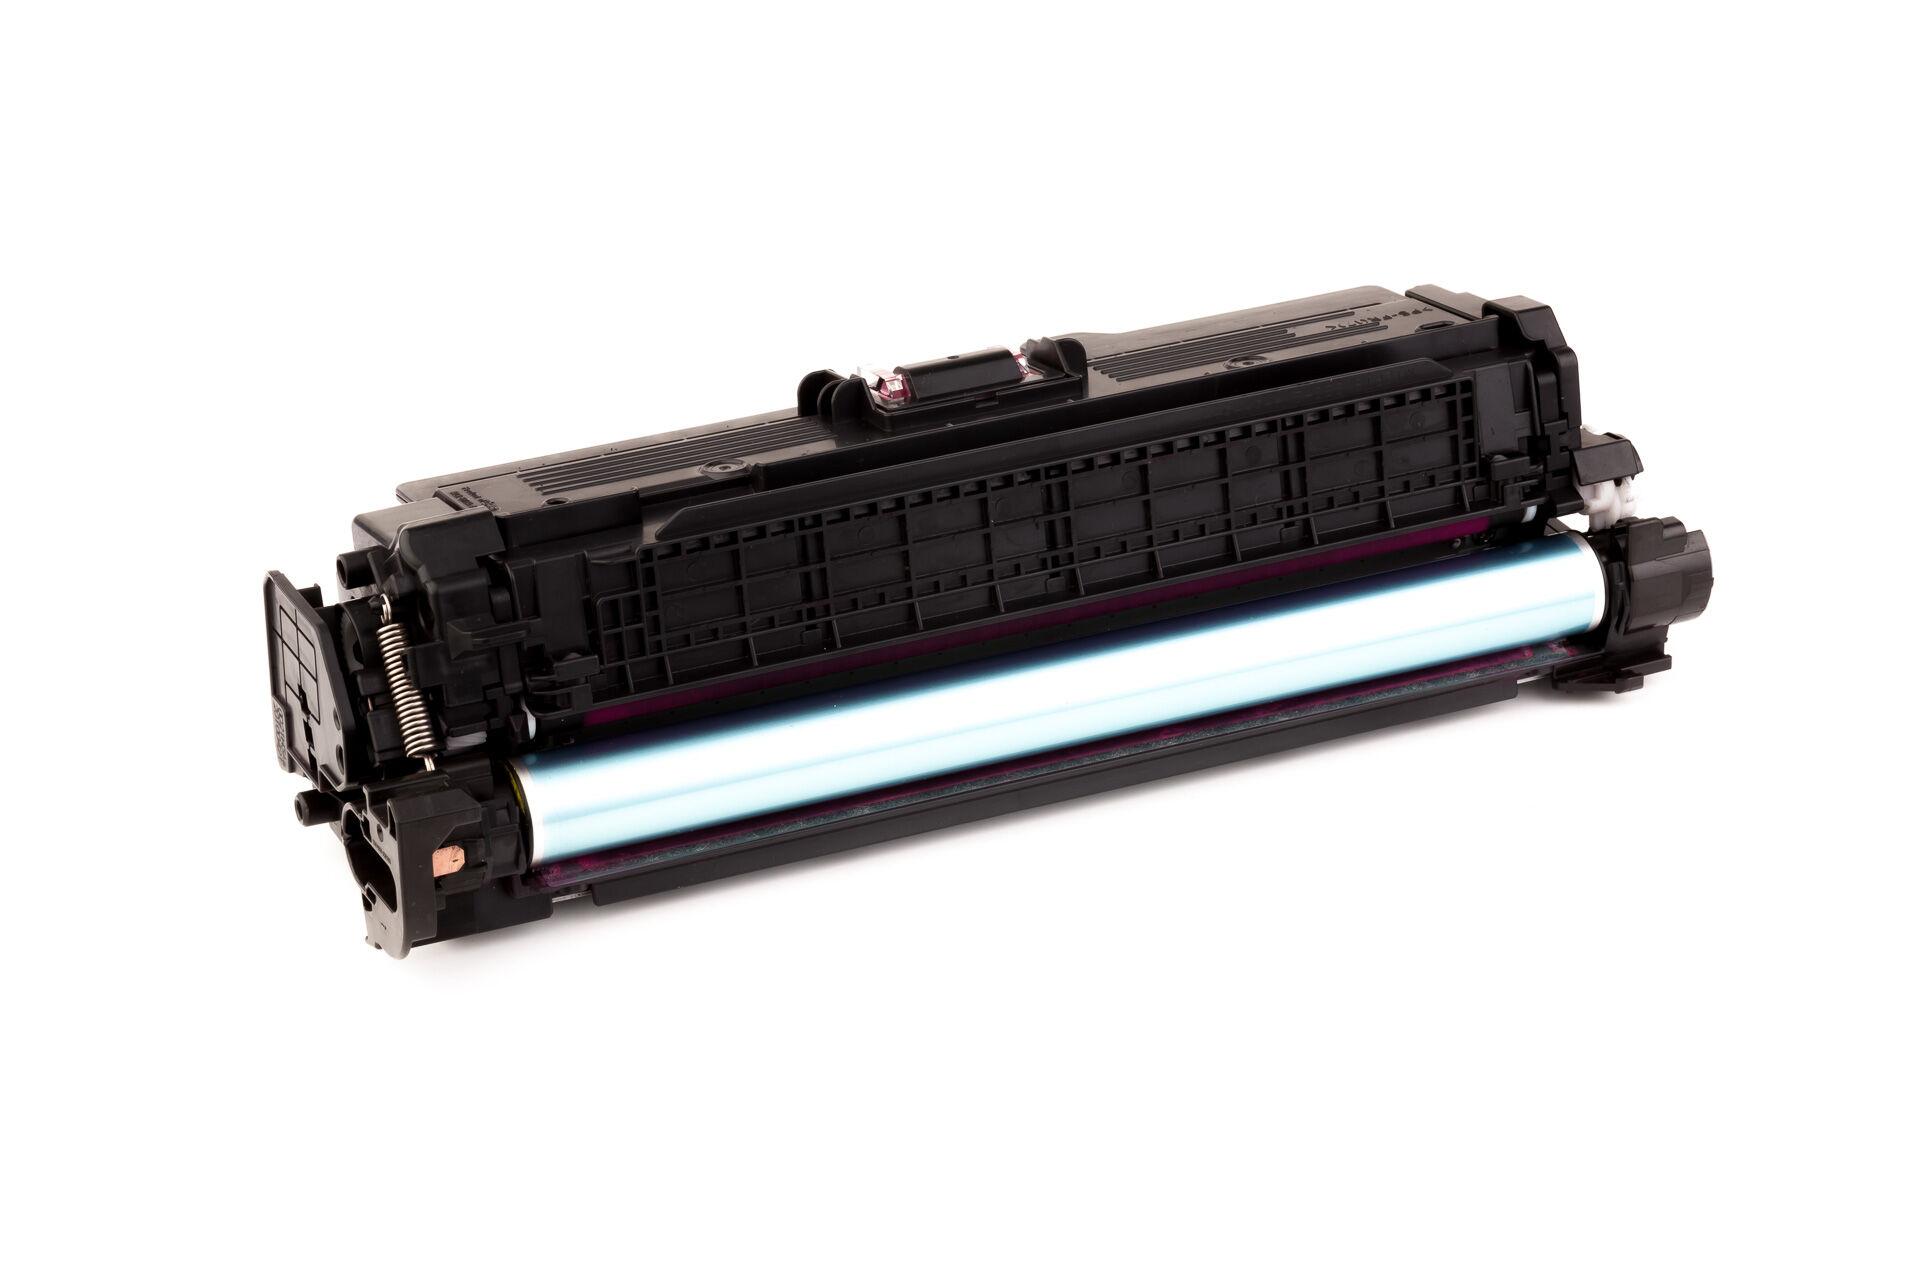 HP Cartouche de Toner pour HP CE253A / 504A magenta compatible (de marque ASC)